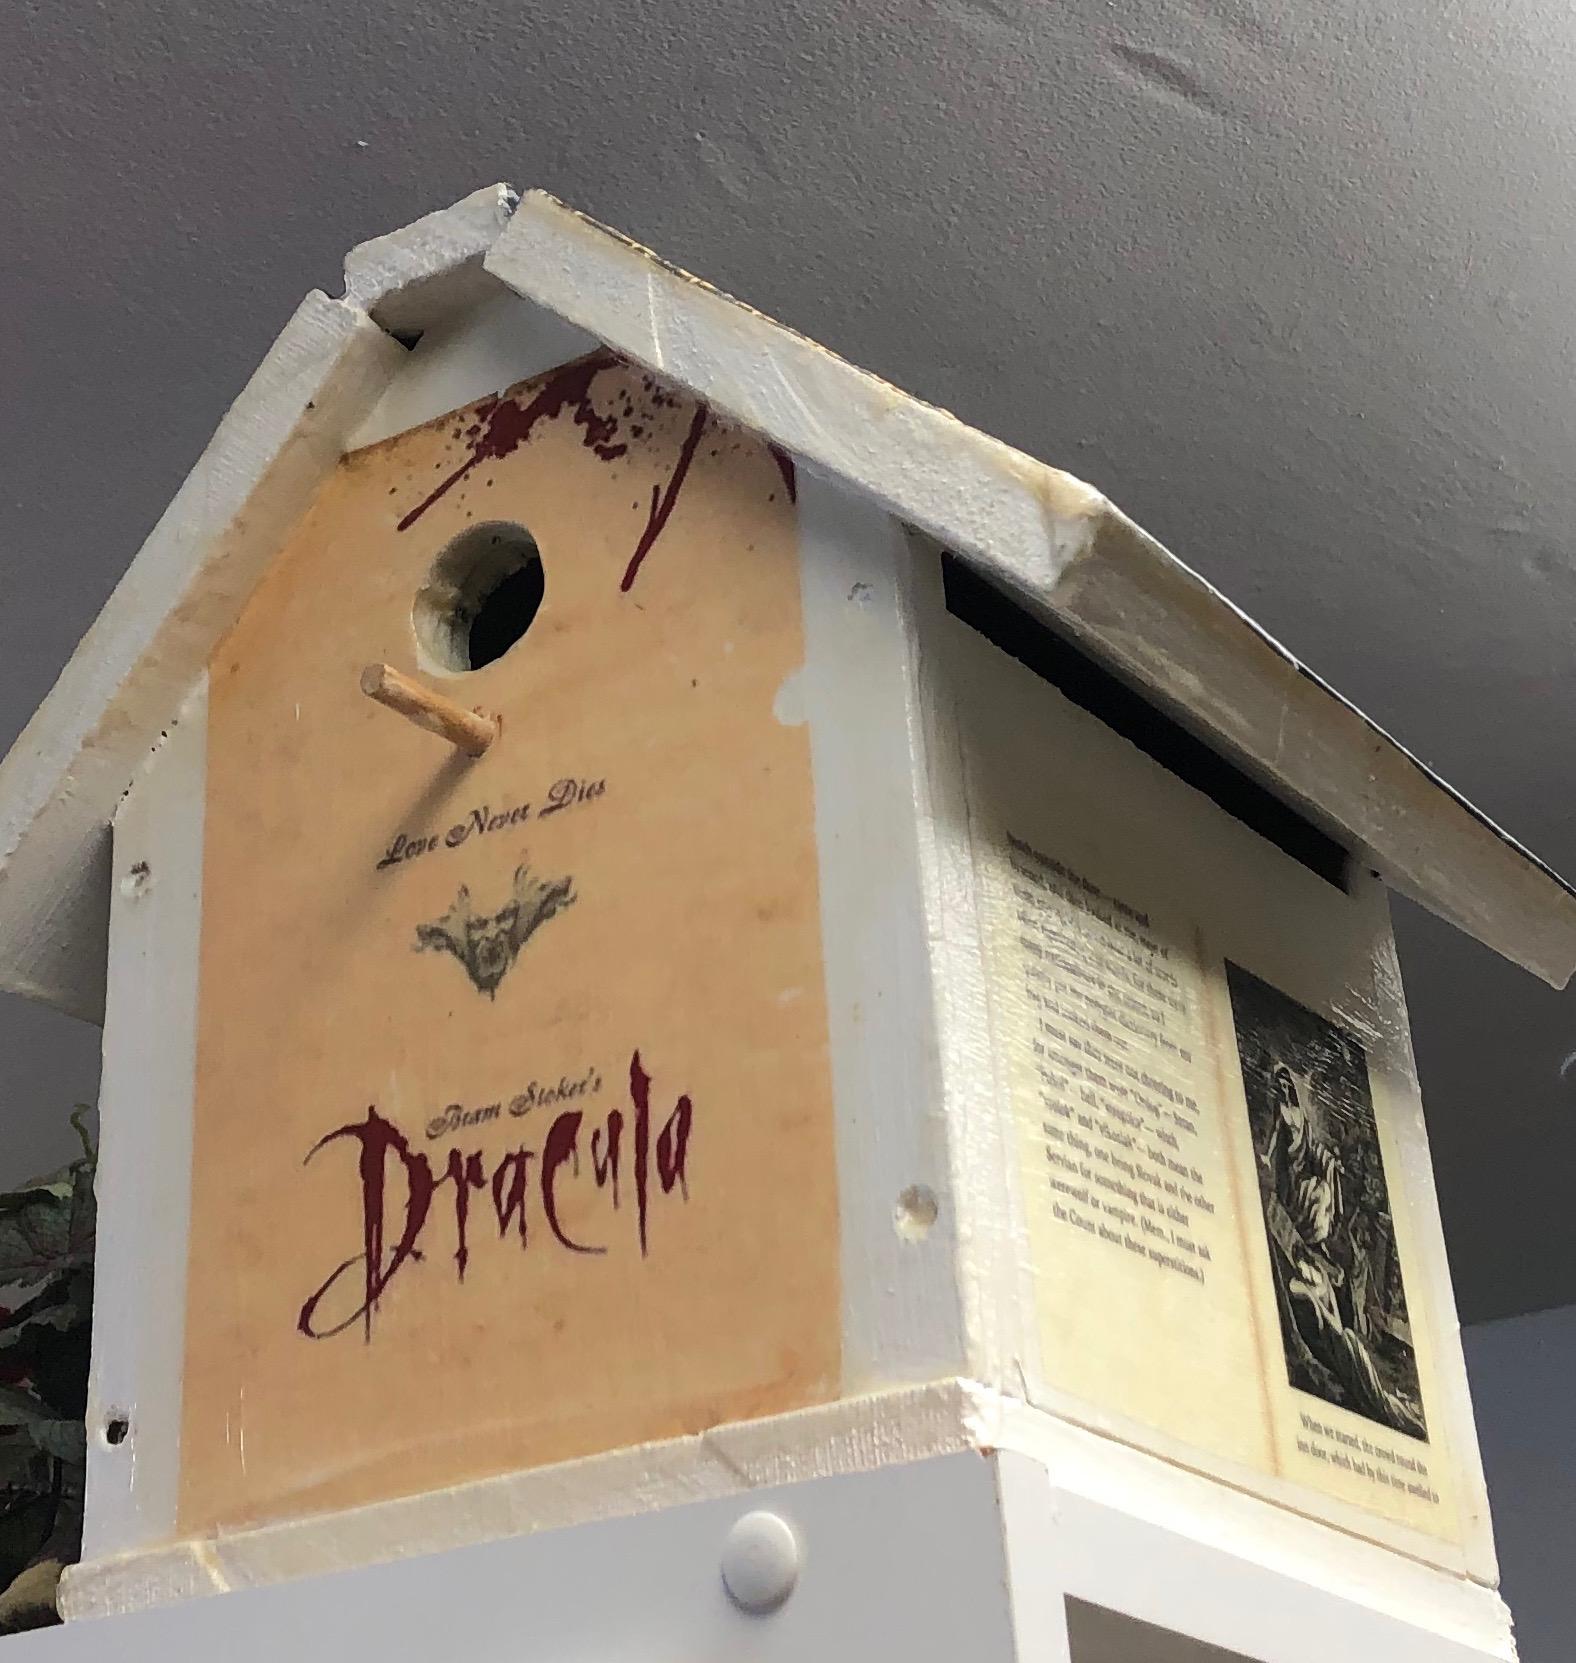 022319-literary-birdhouse-Dracula